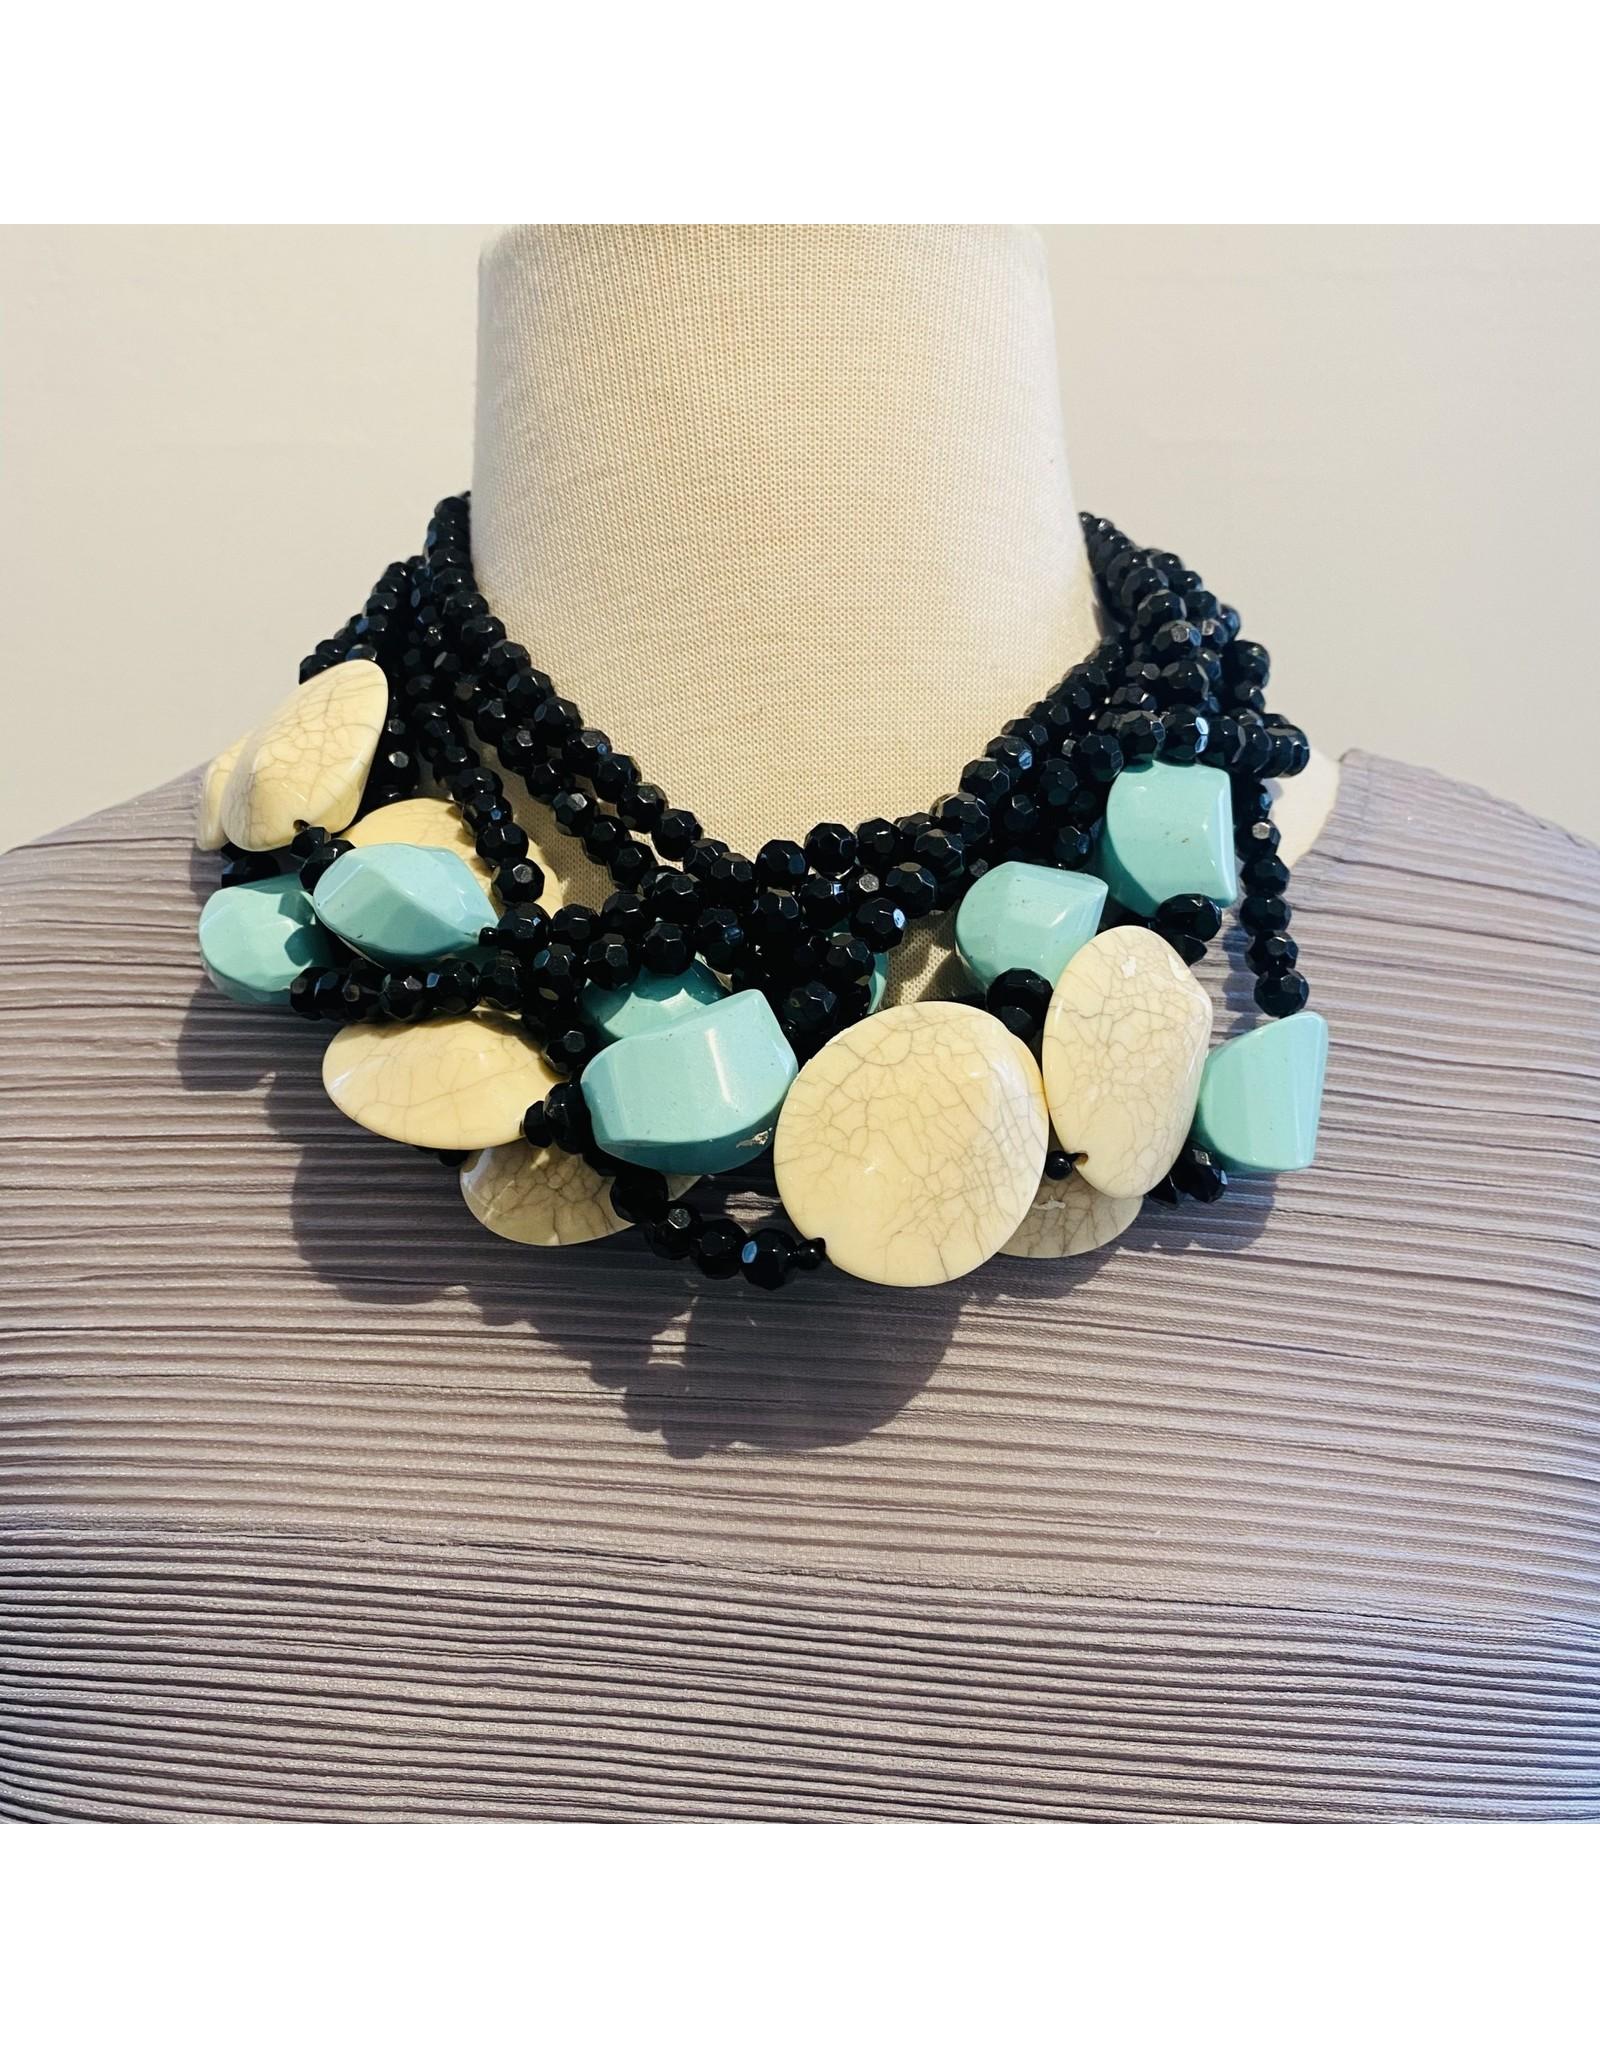 Angela Caputi Black, Cream and Turquoise Necklace